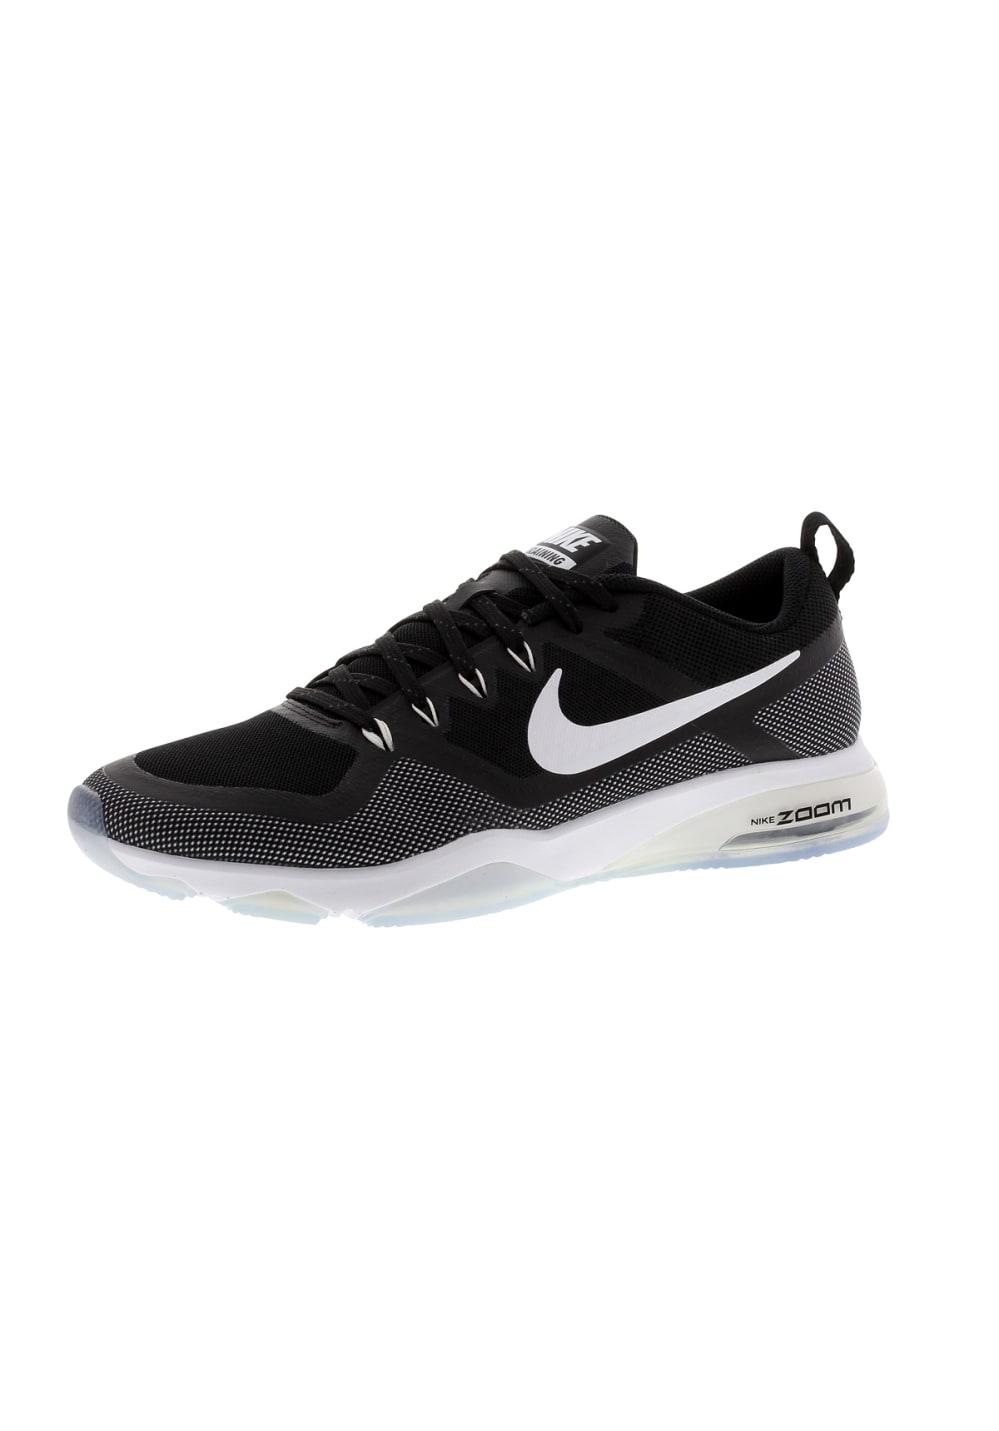 2ae722aad9a Nike Zoom Fitness - Zapatillas de fitness para Mujer - Negro